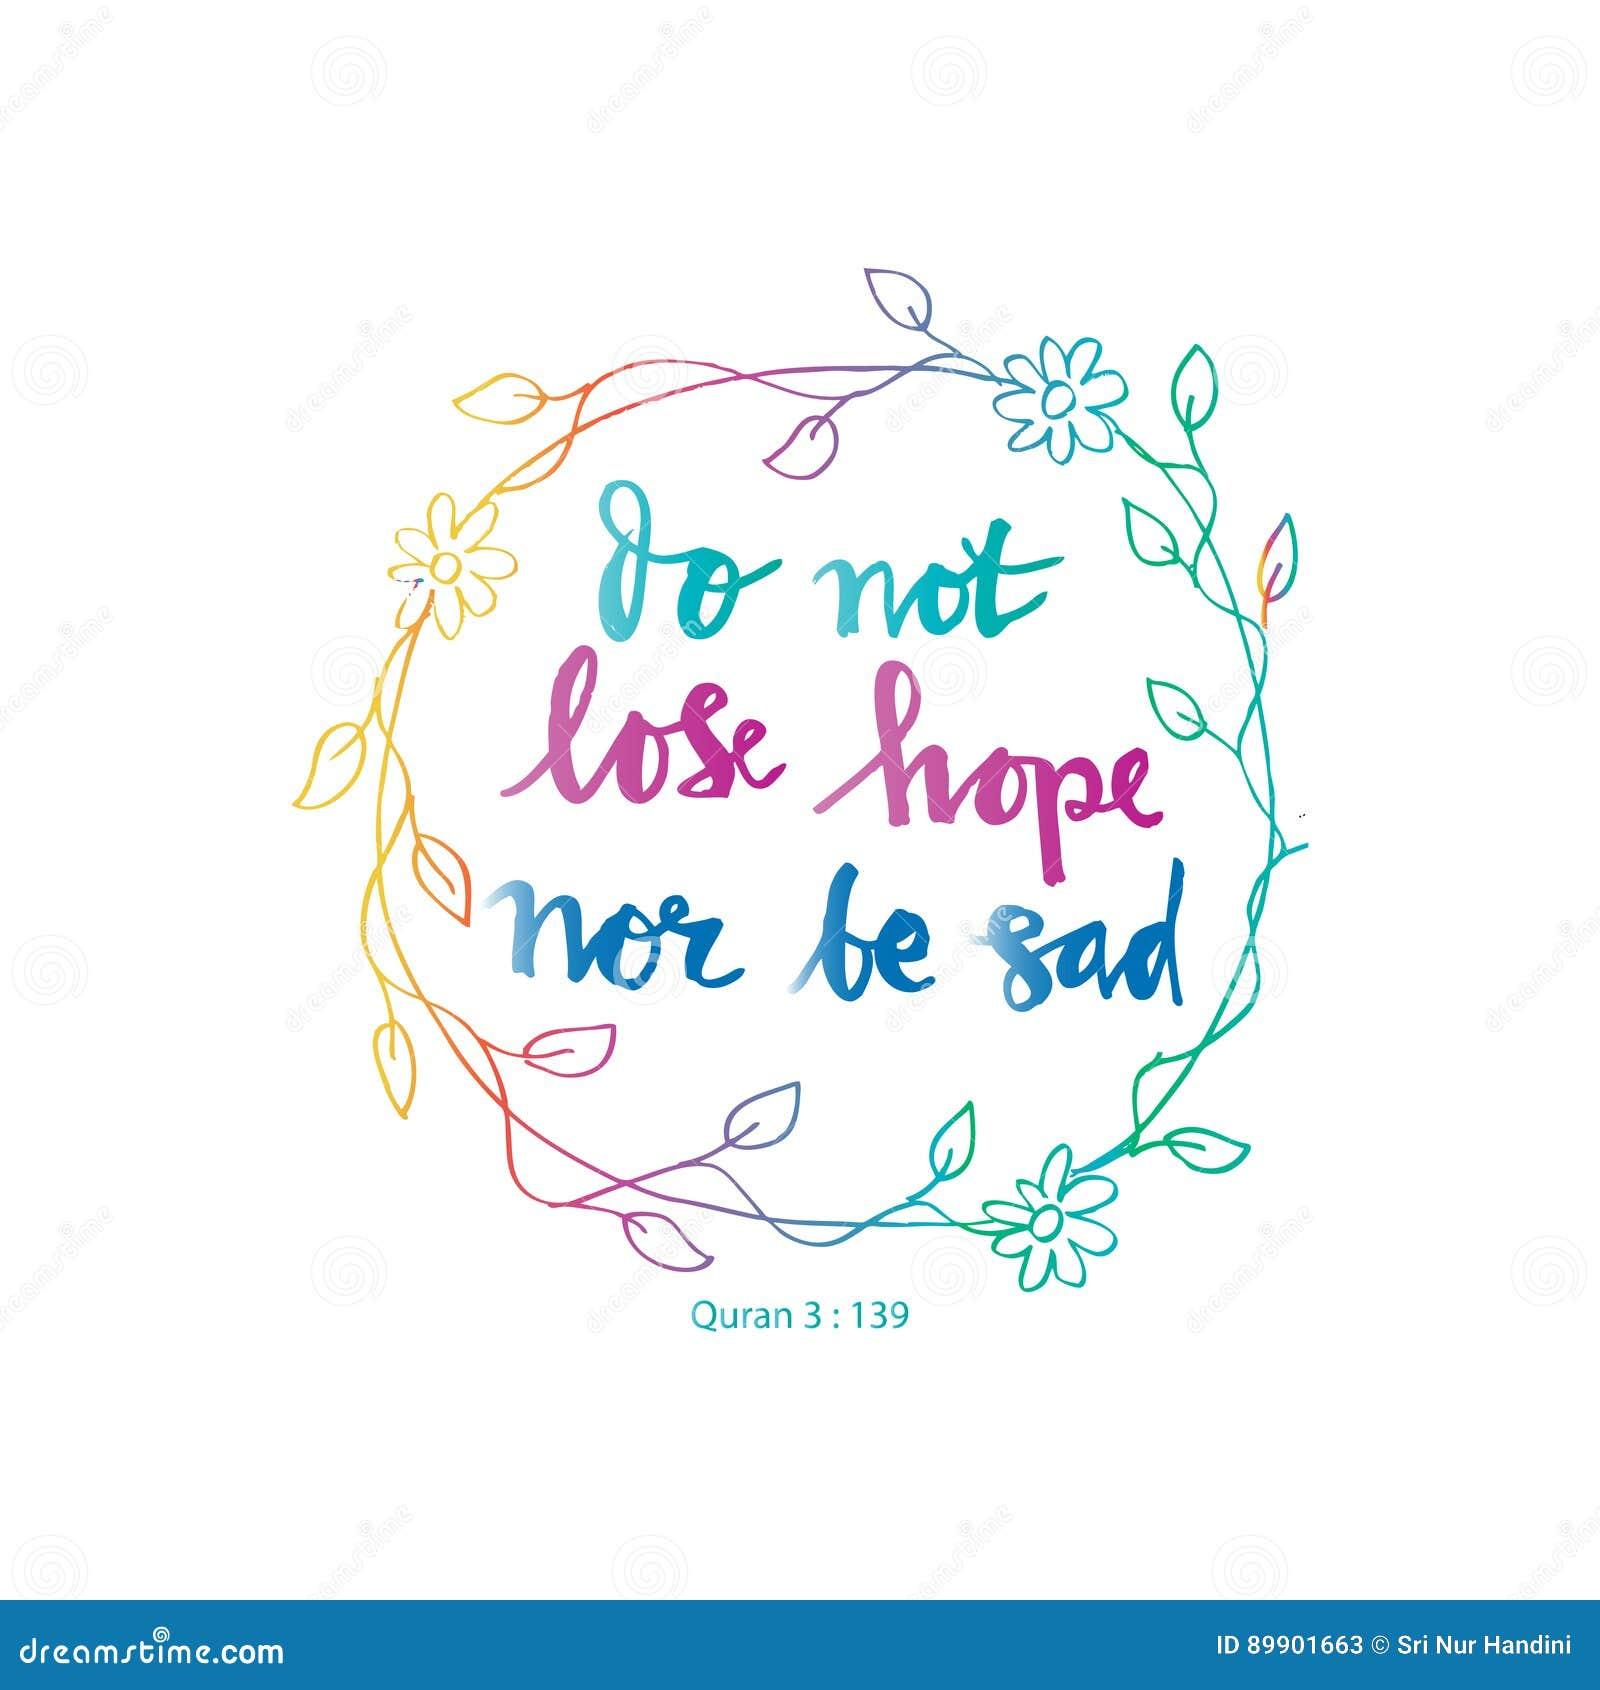 No gubi nadziei nor jest smutny